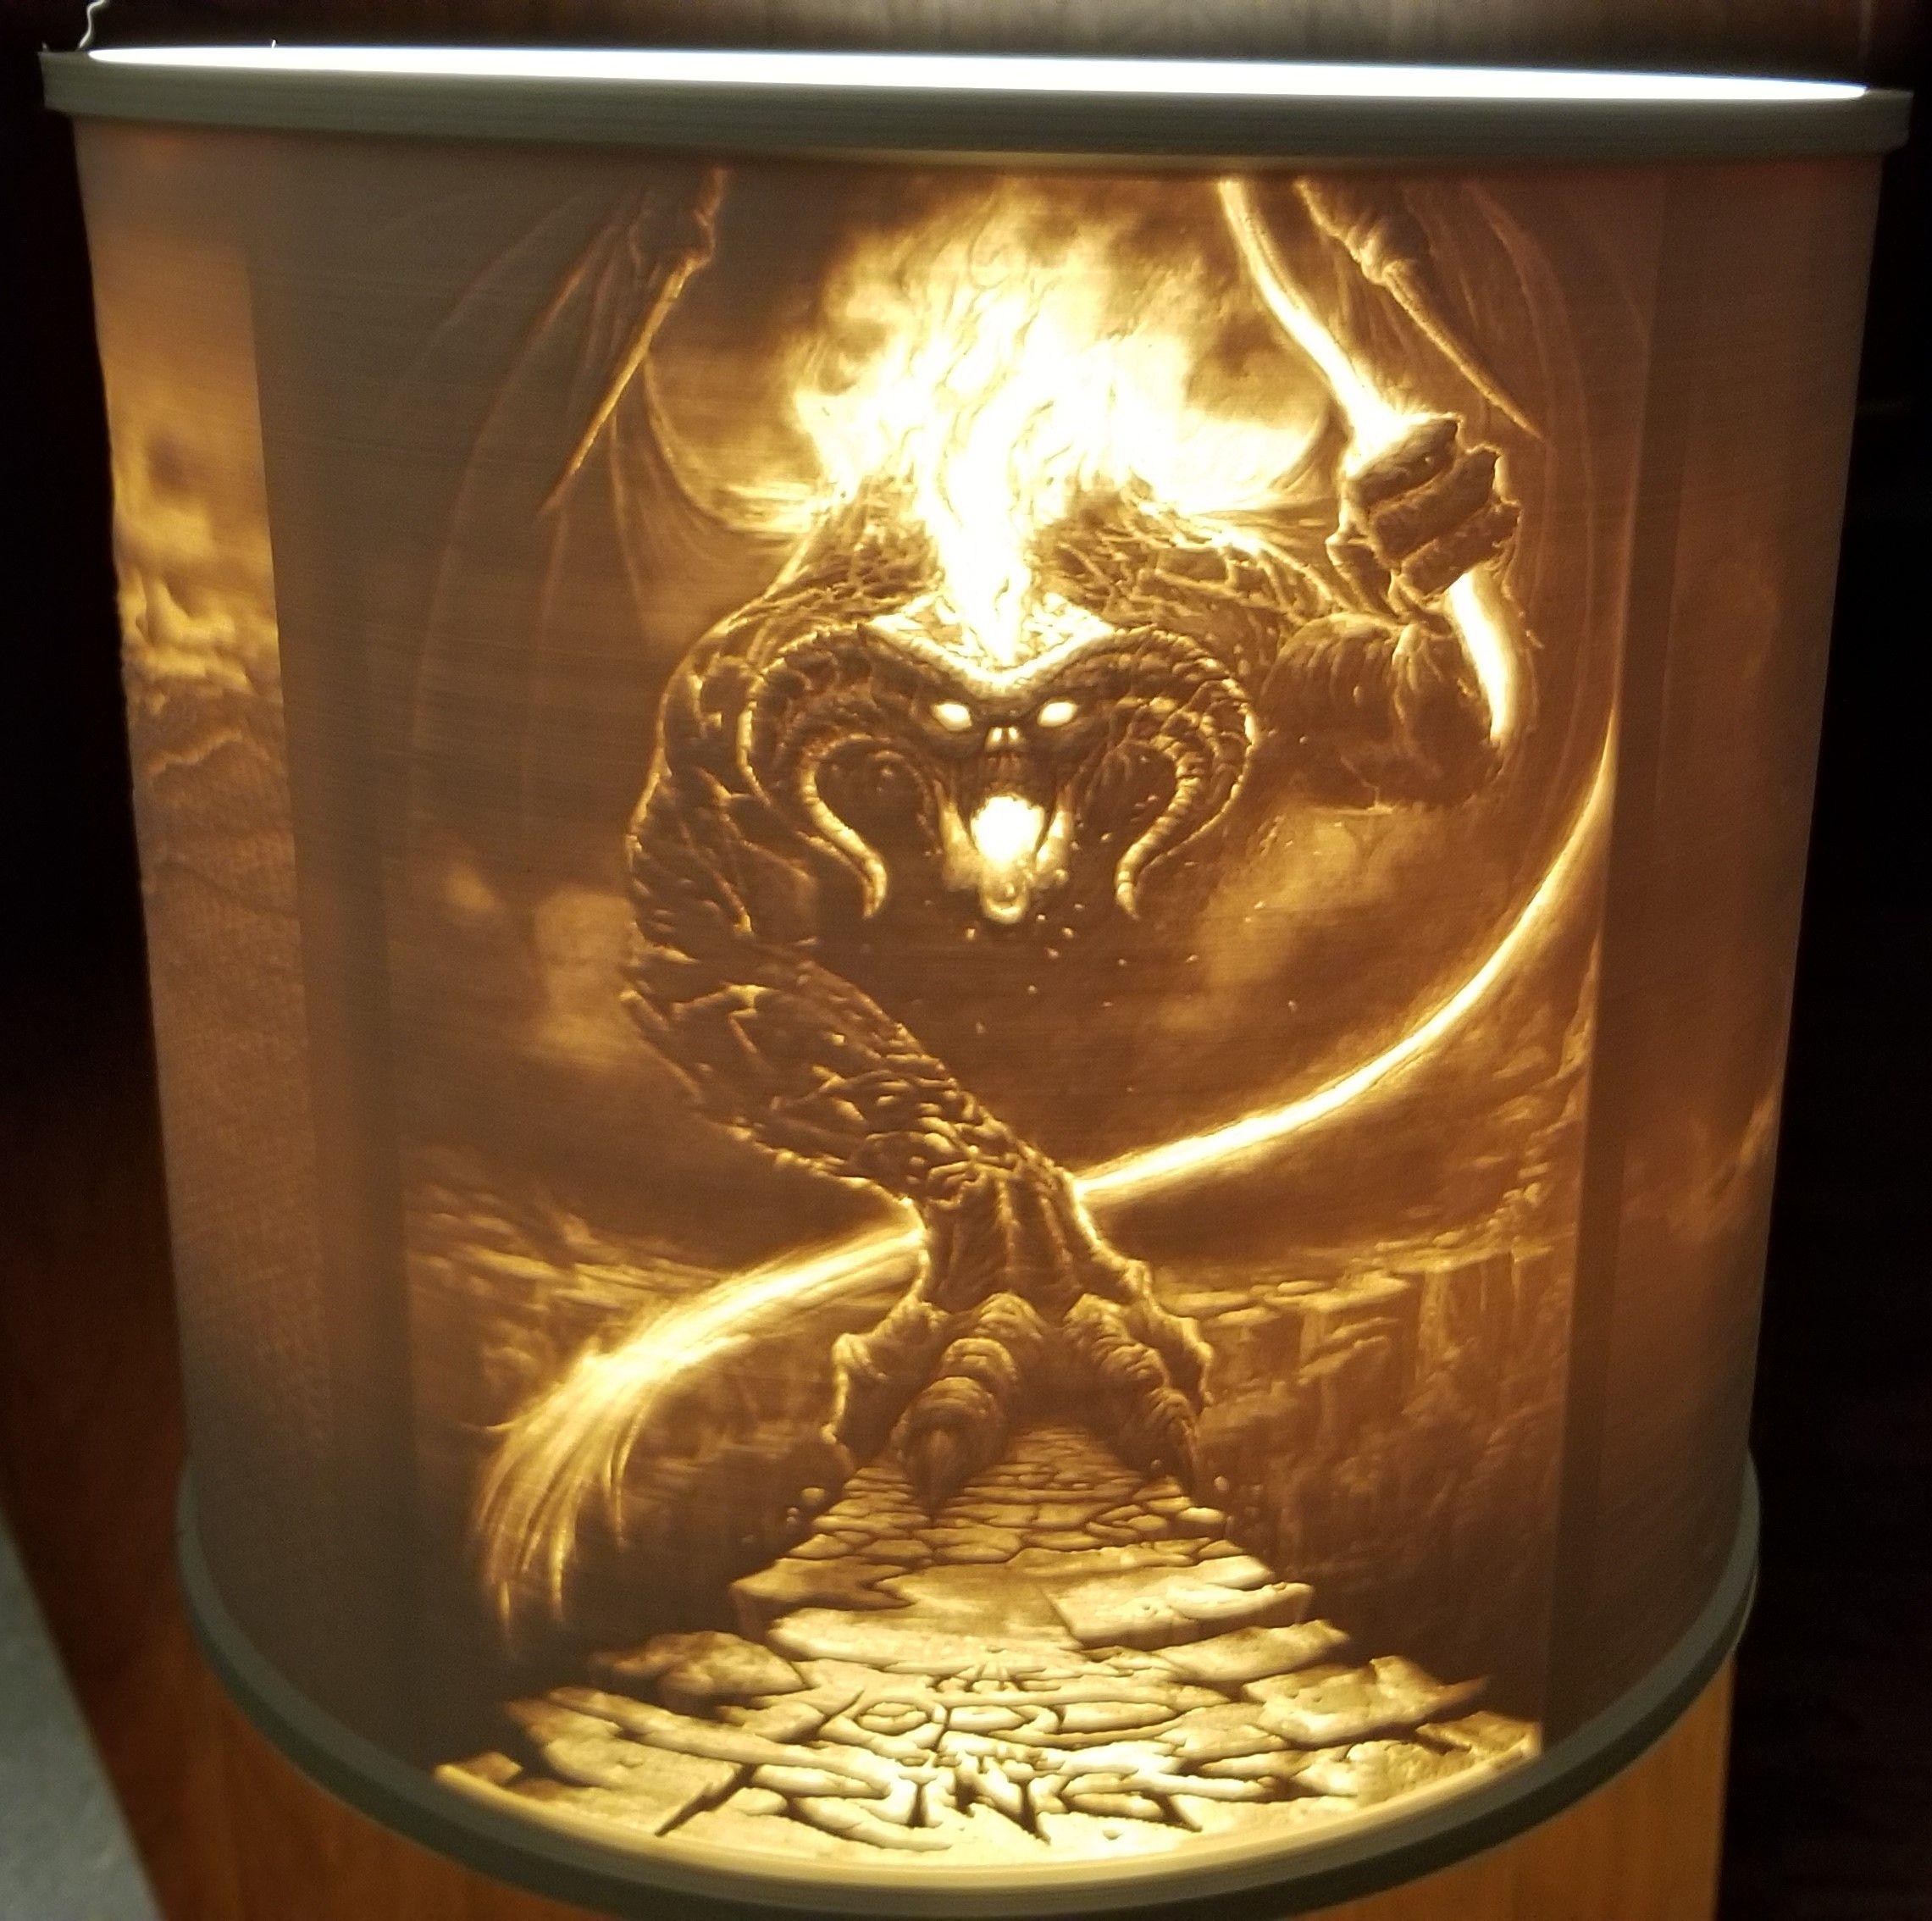 Images Lithophane Lamp Schematic Jpg Lampshade Designs Lamp Prints